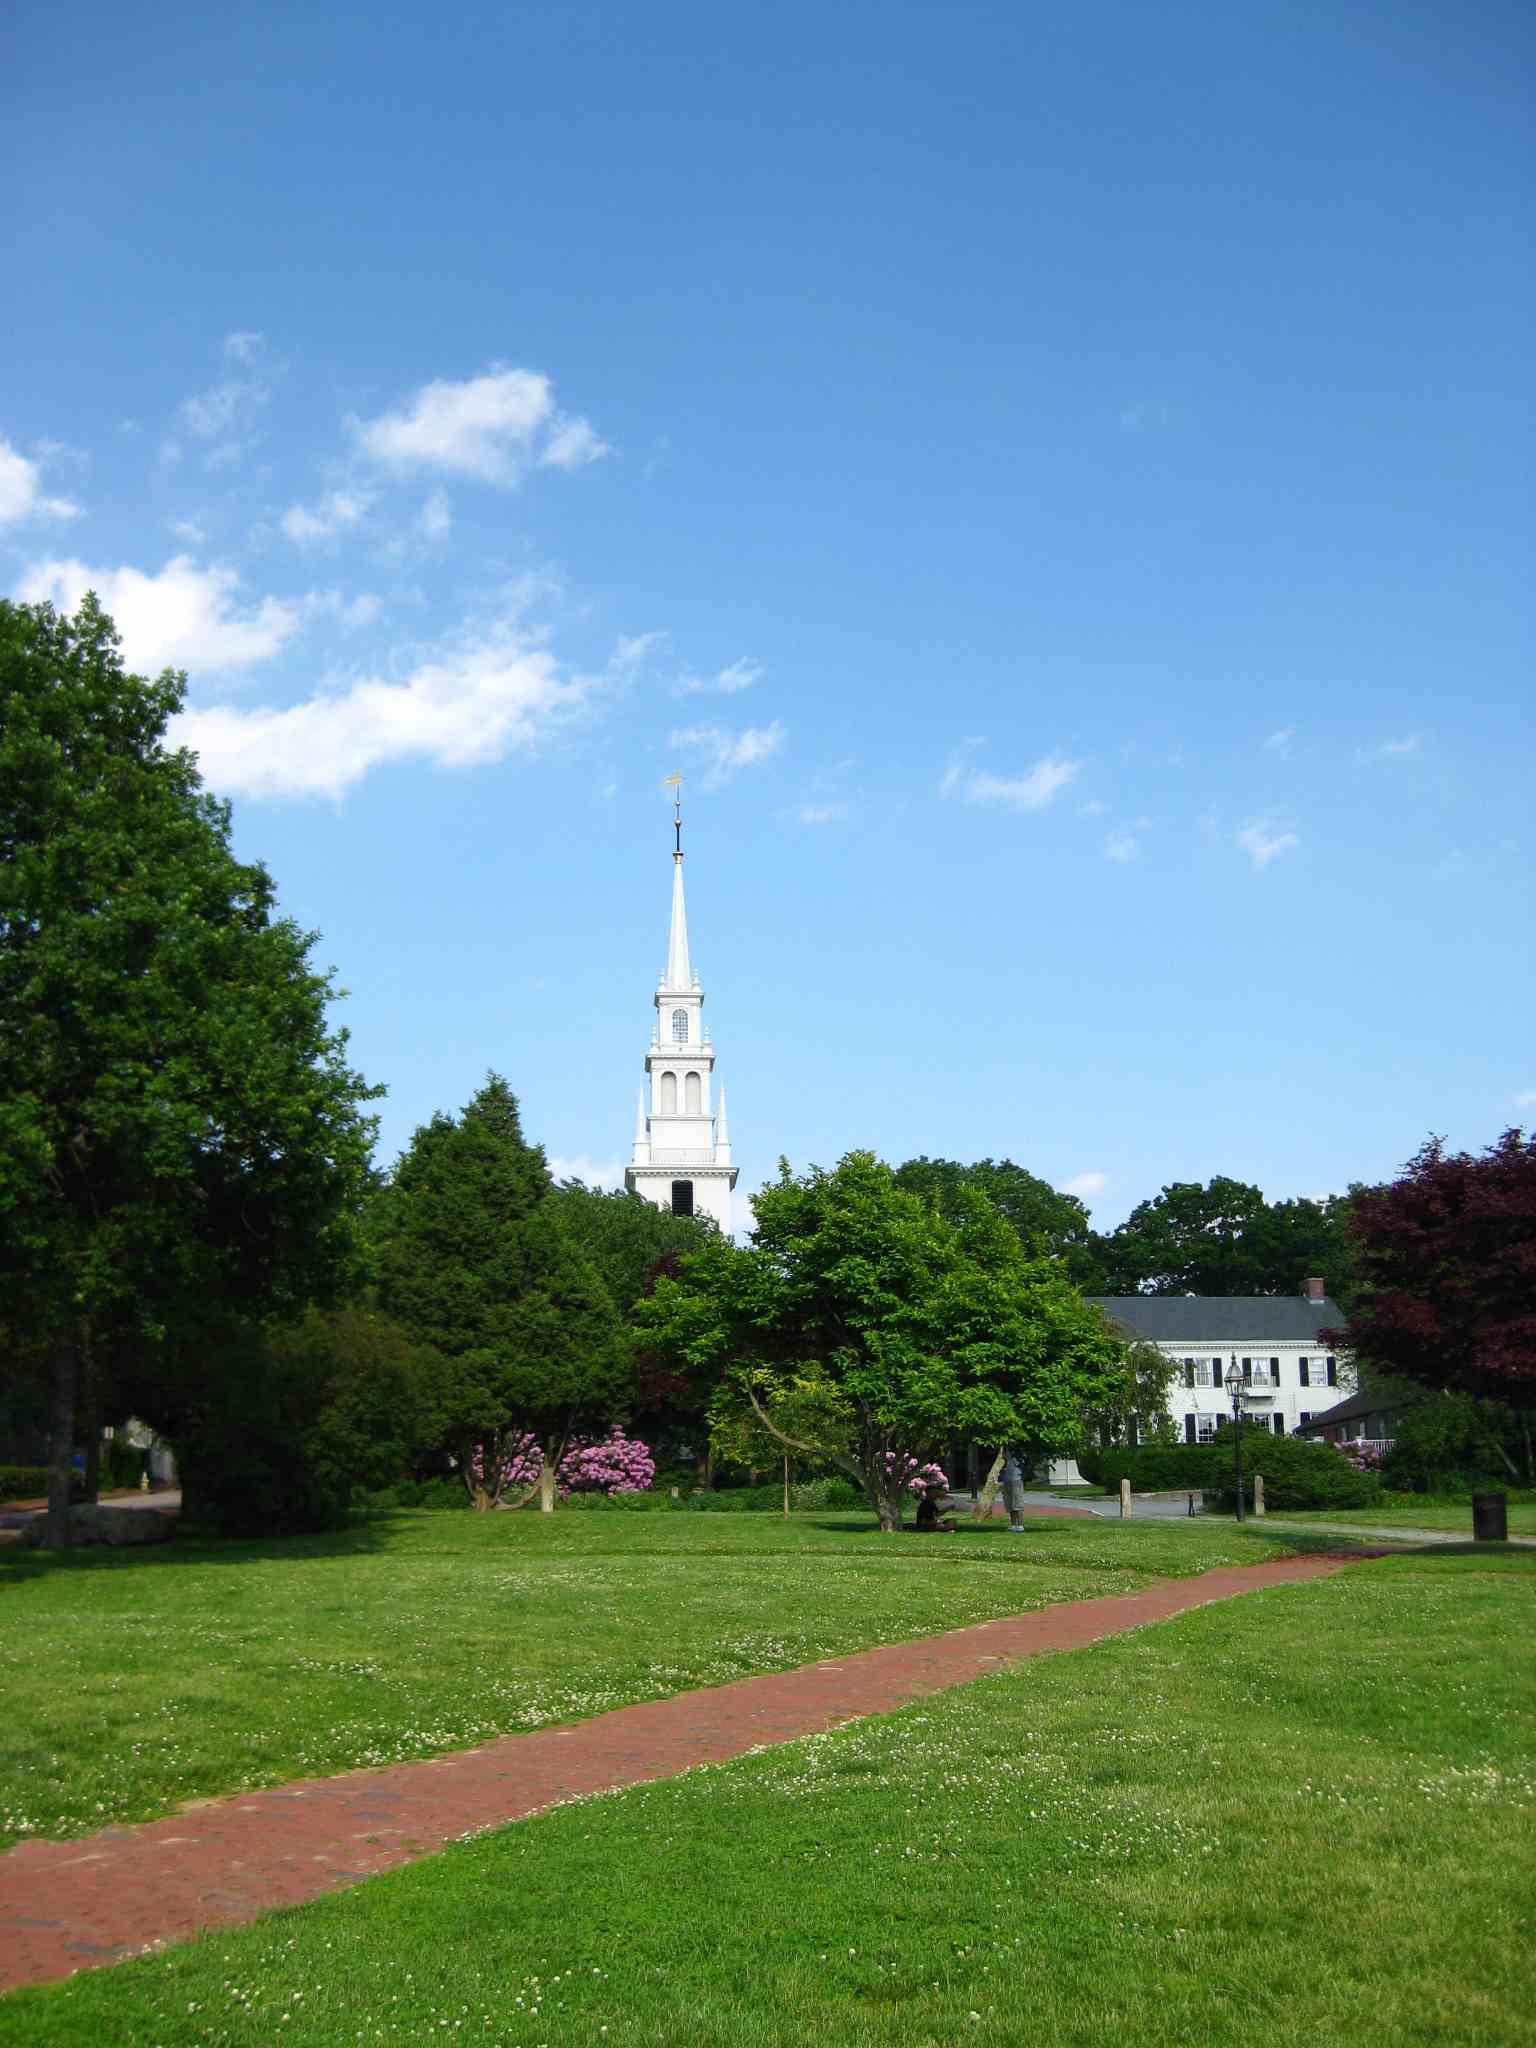 Newport, Rhode Island